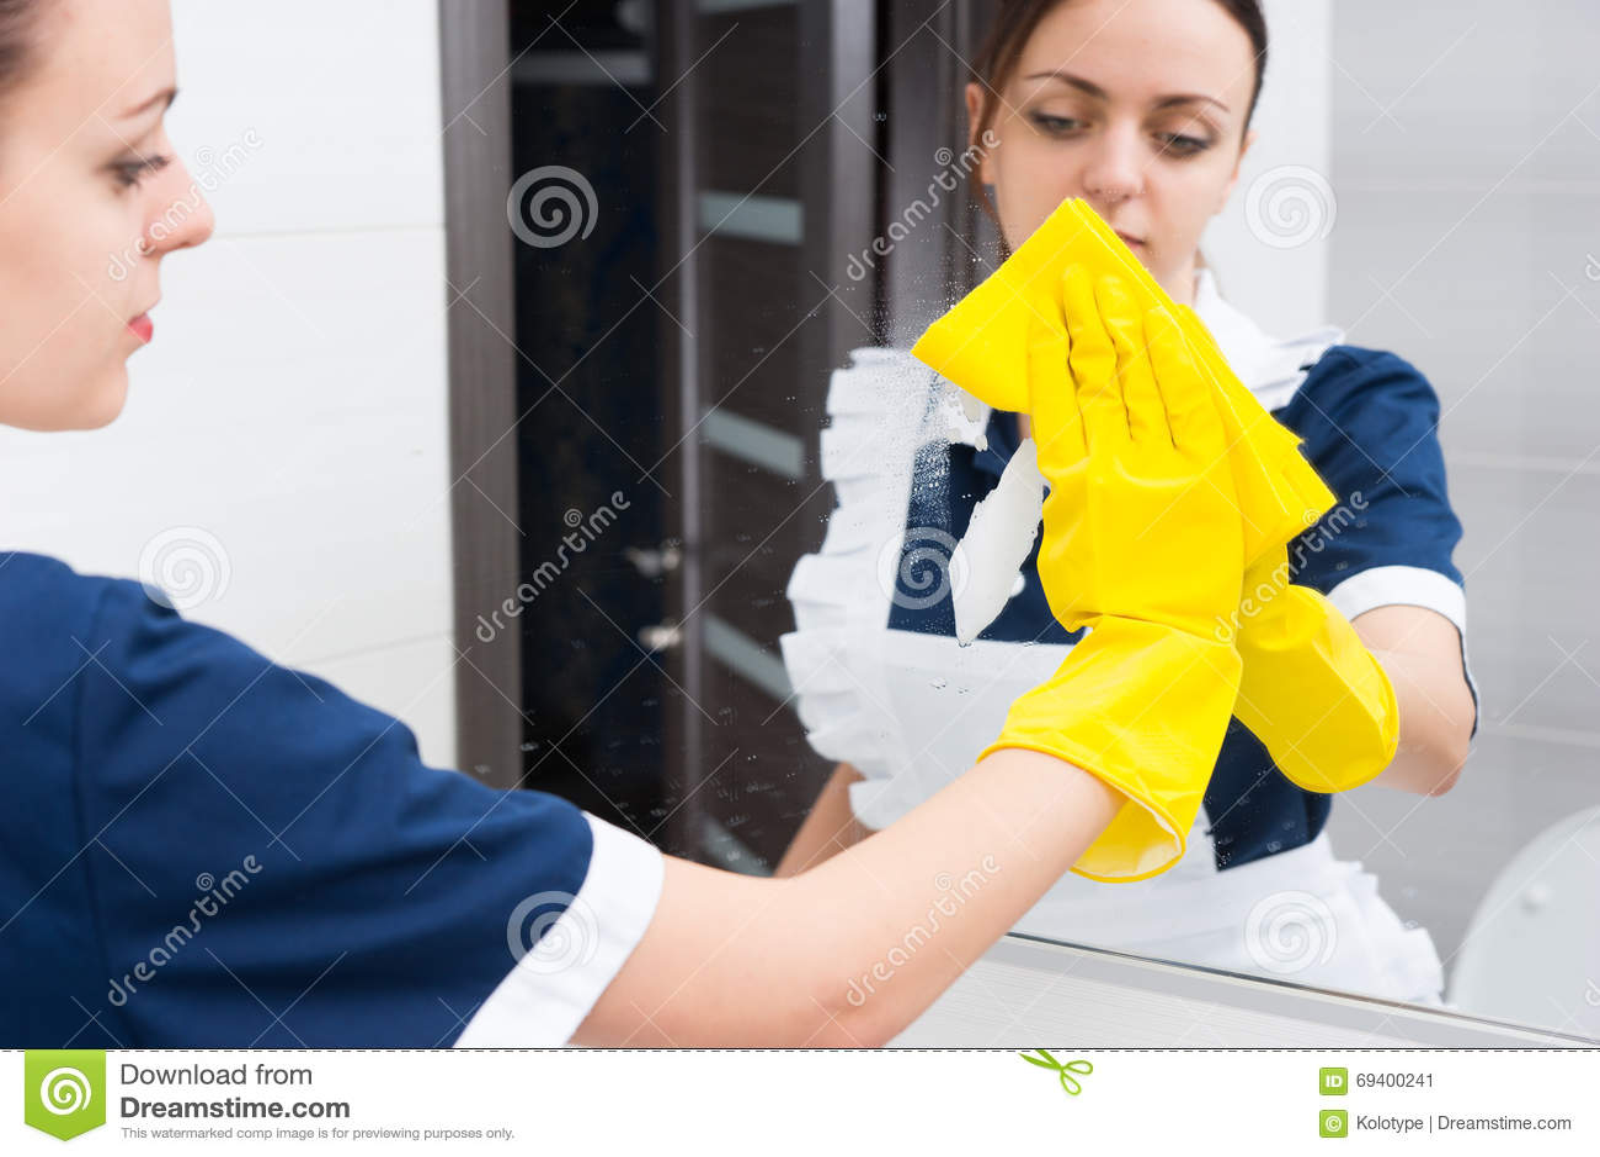 How to clean bathroom mirror - Female Hotel Maid Wiping Bathroom Mirror Stock Image